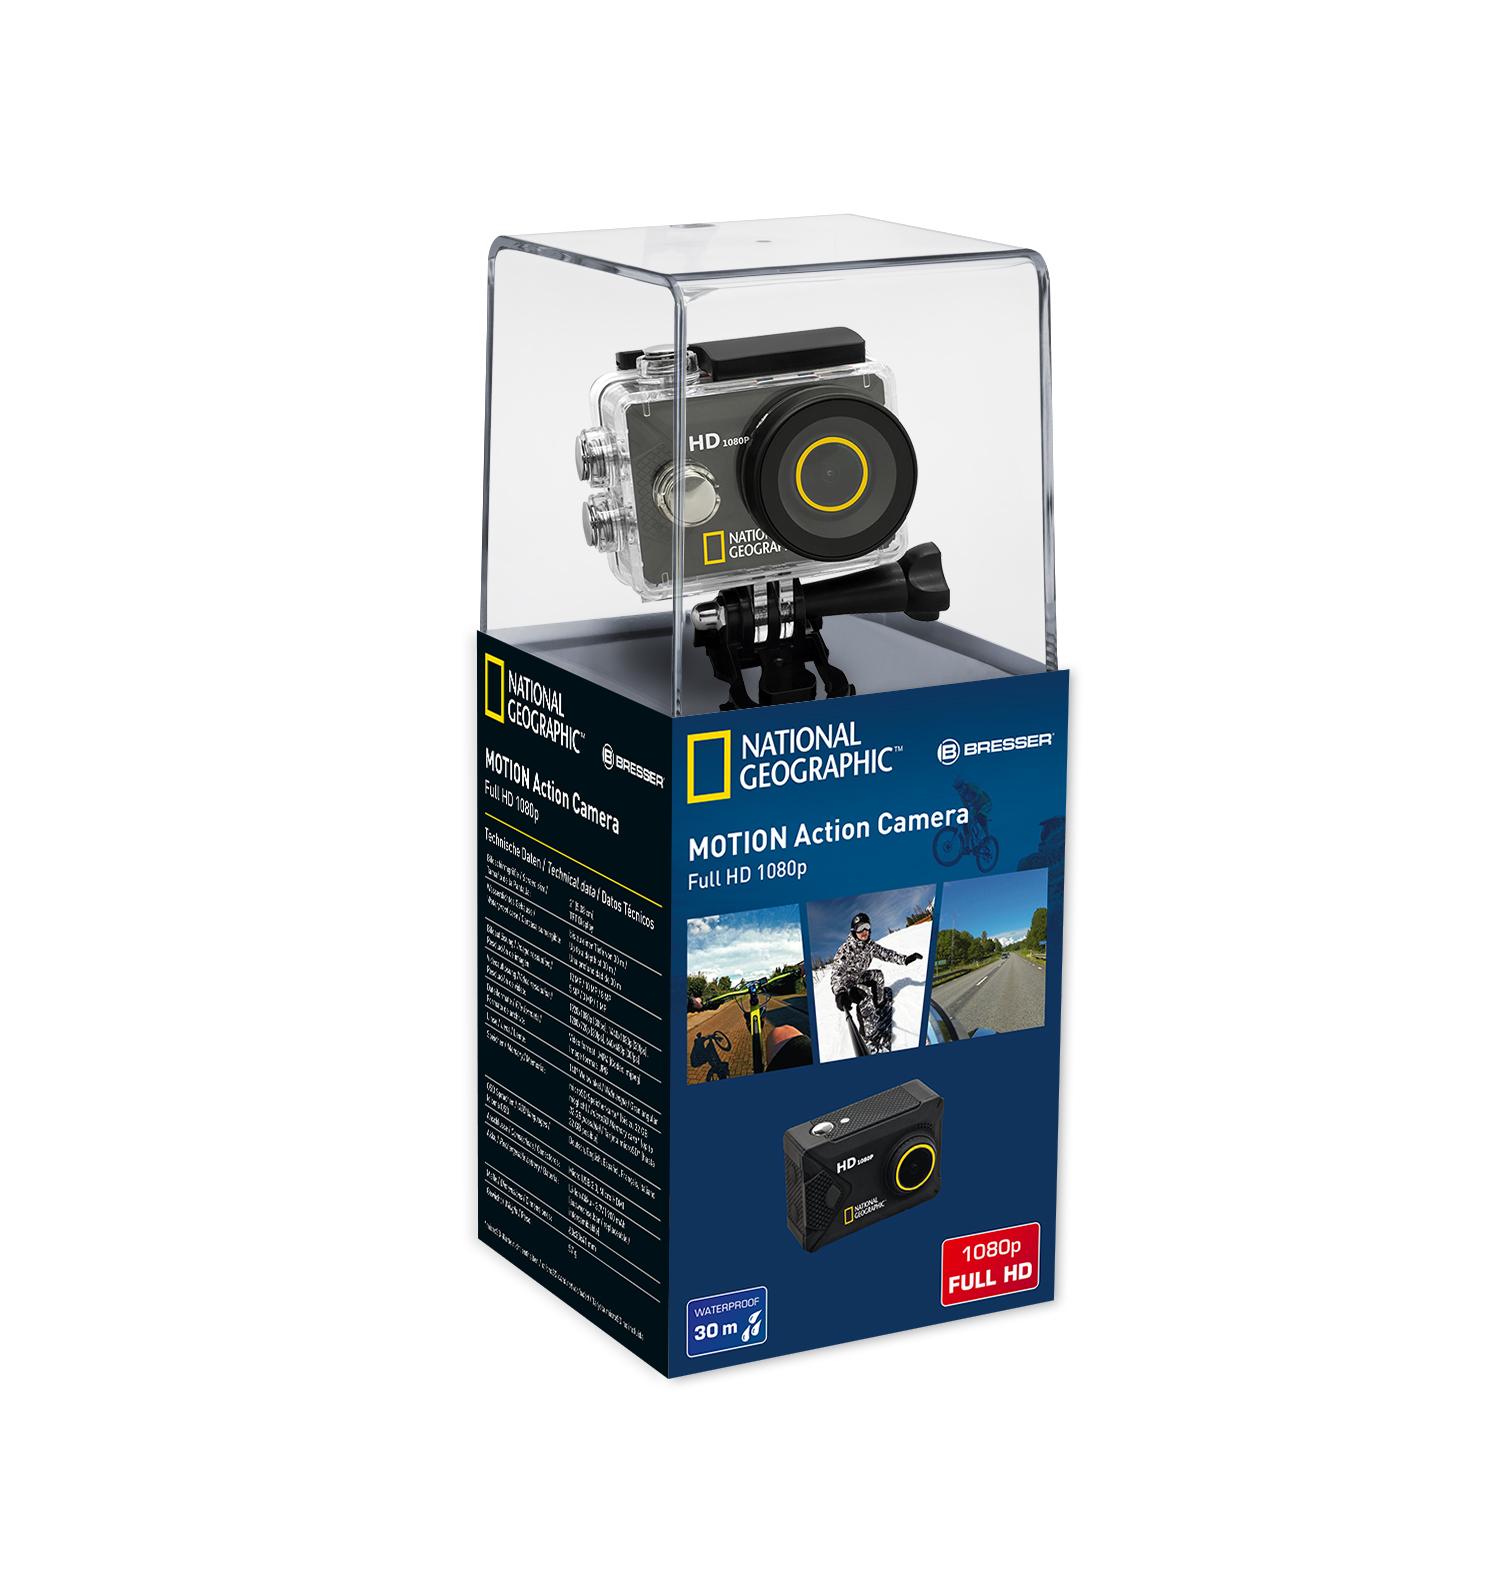 prox11 full hd actionkamera